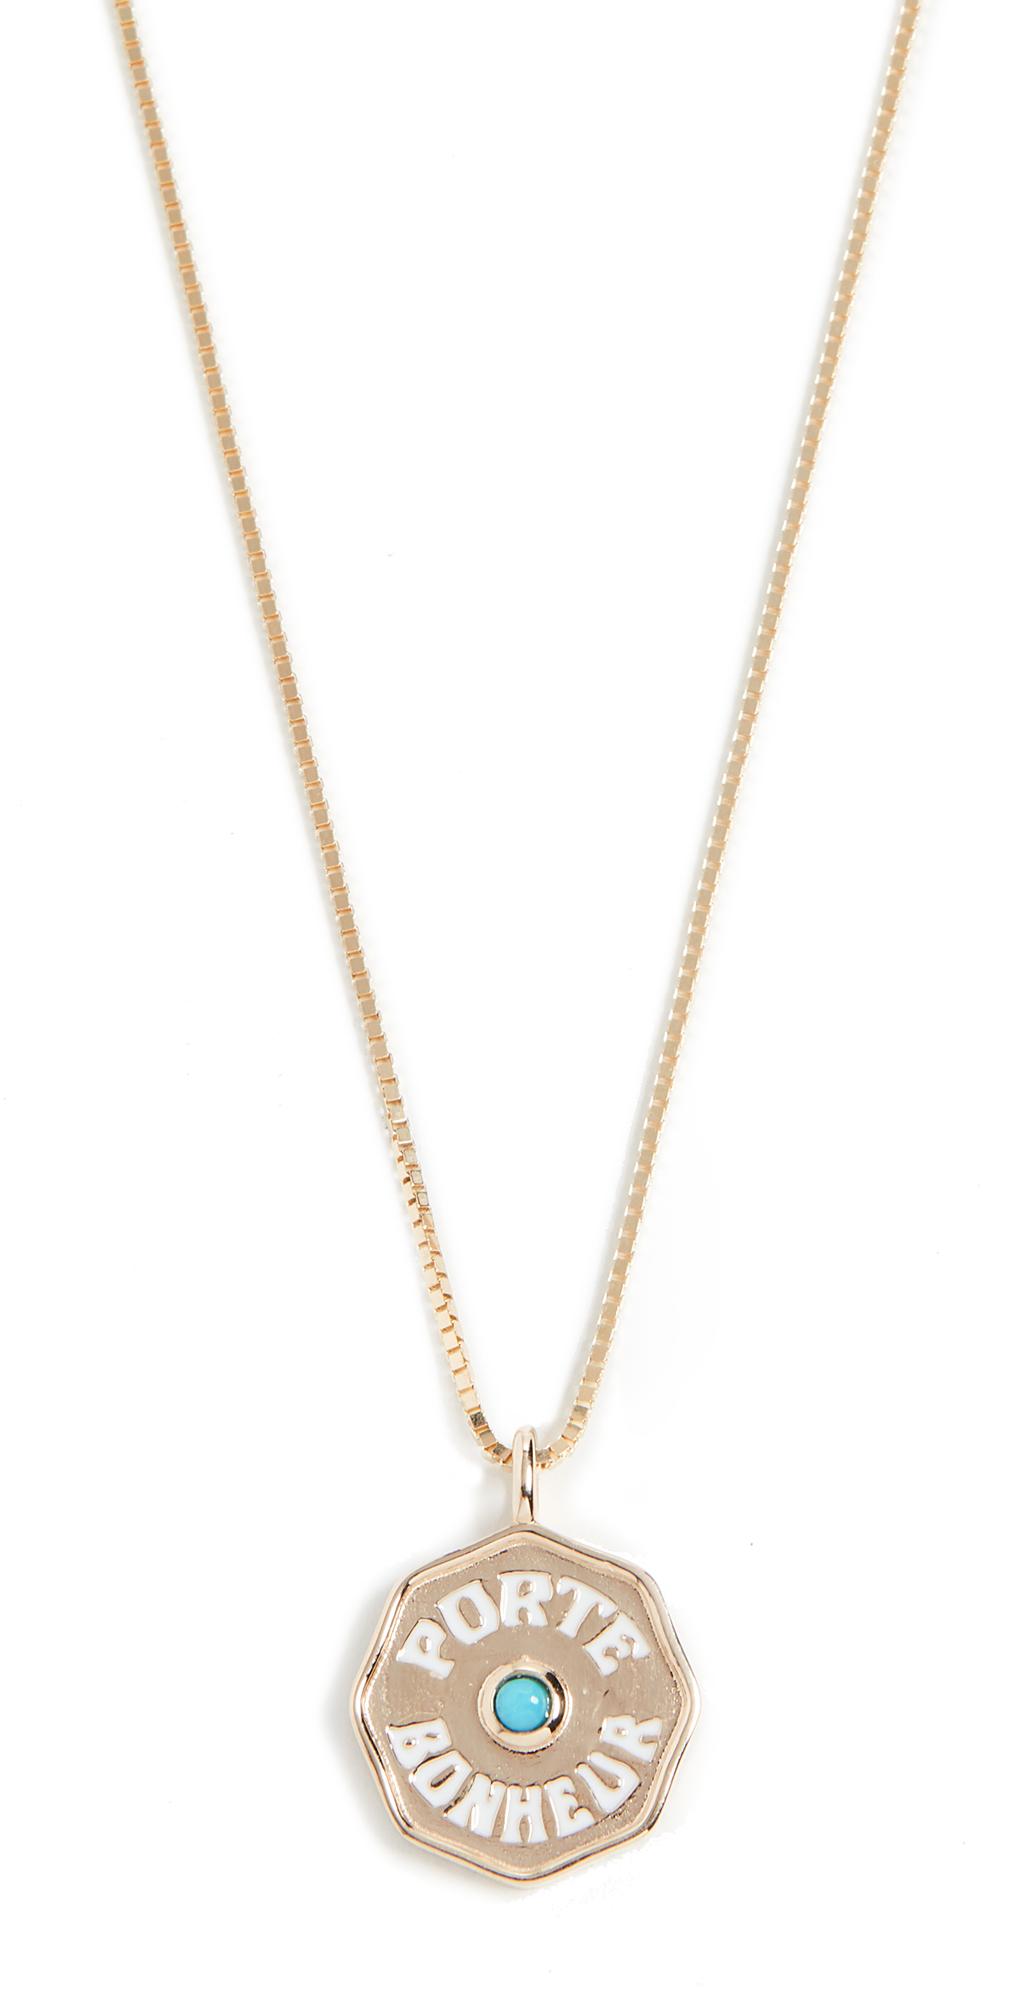 14k Mini Pb Coin Necklace